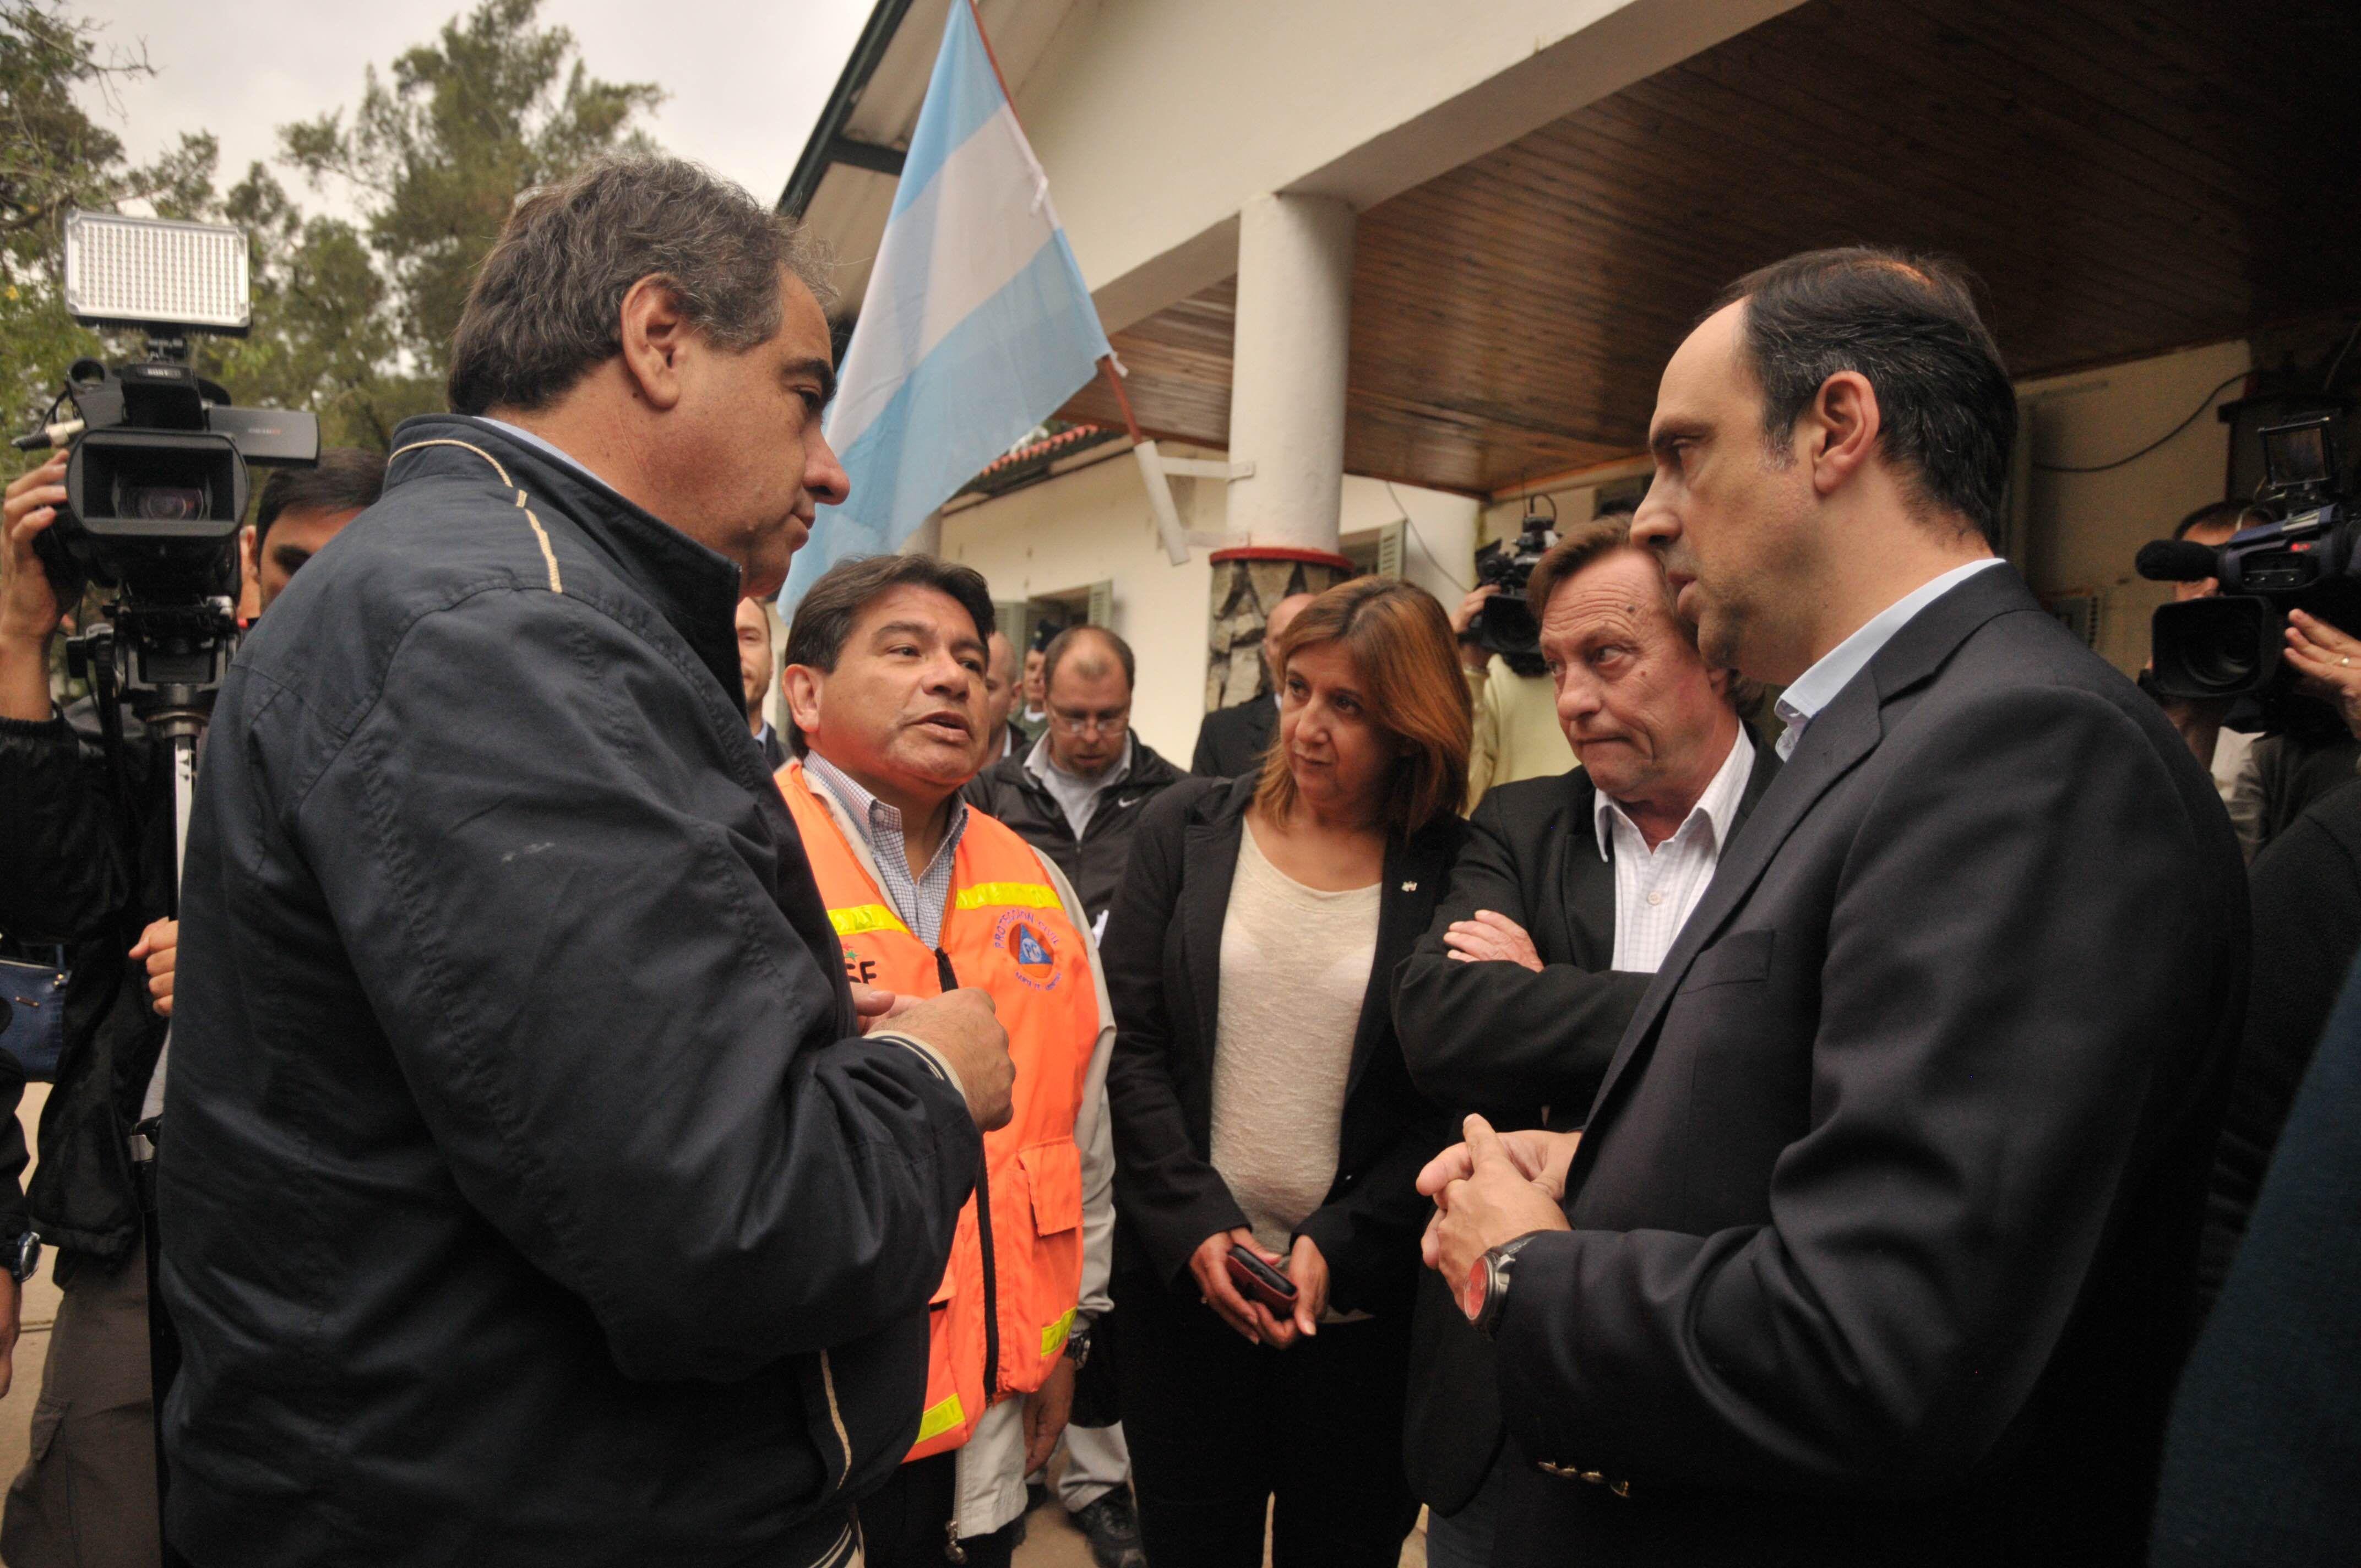 El ministro de Defensa recorrió gran parte de Santa Fe